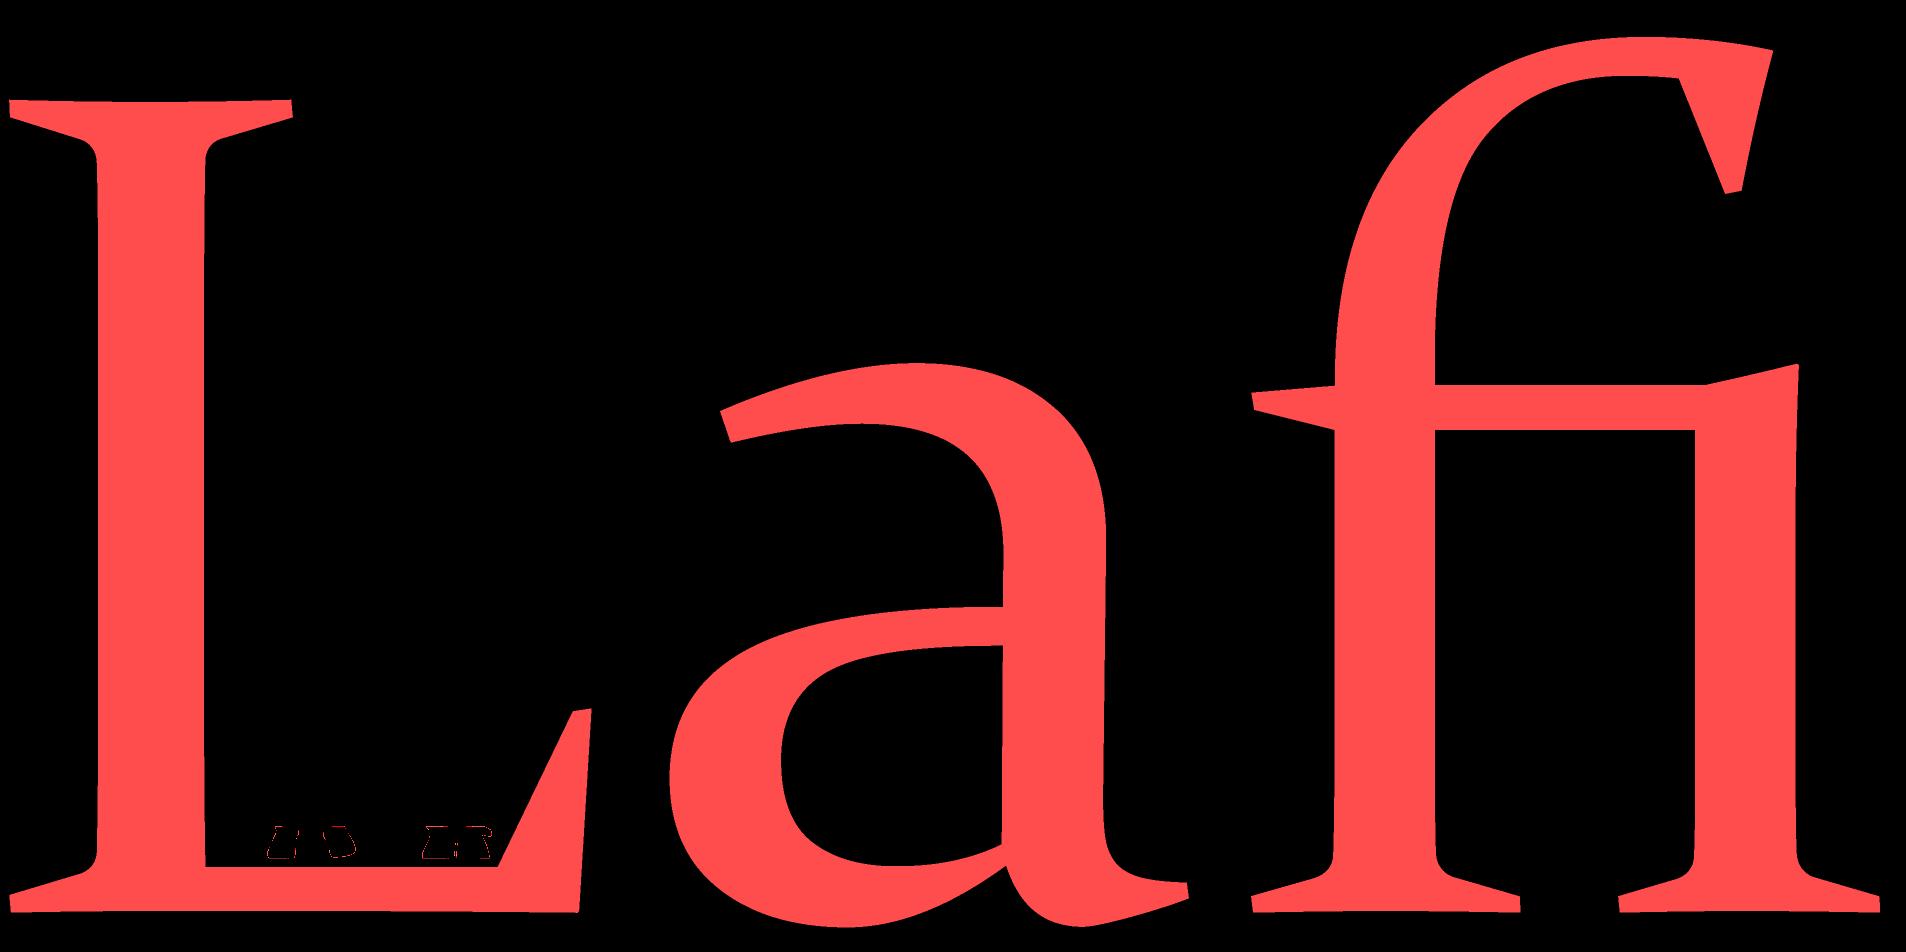 Lafi-Mode